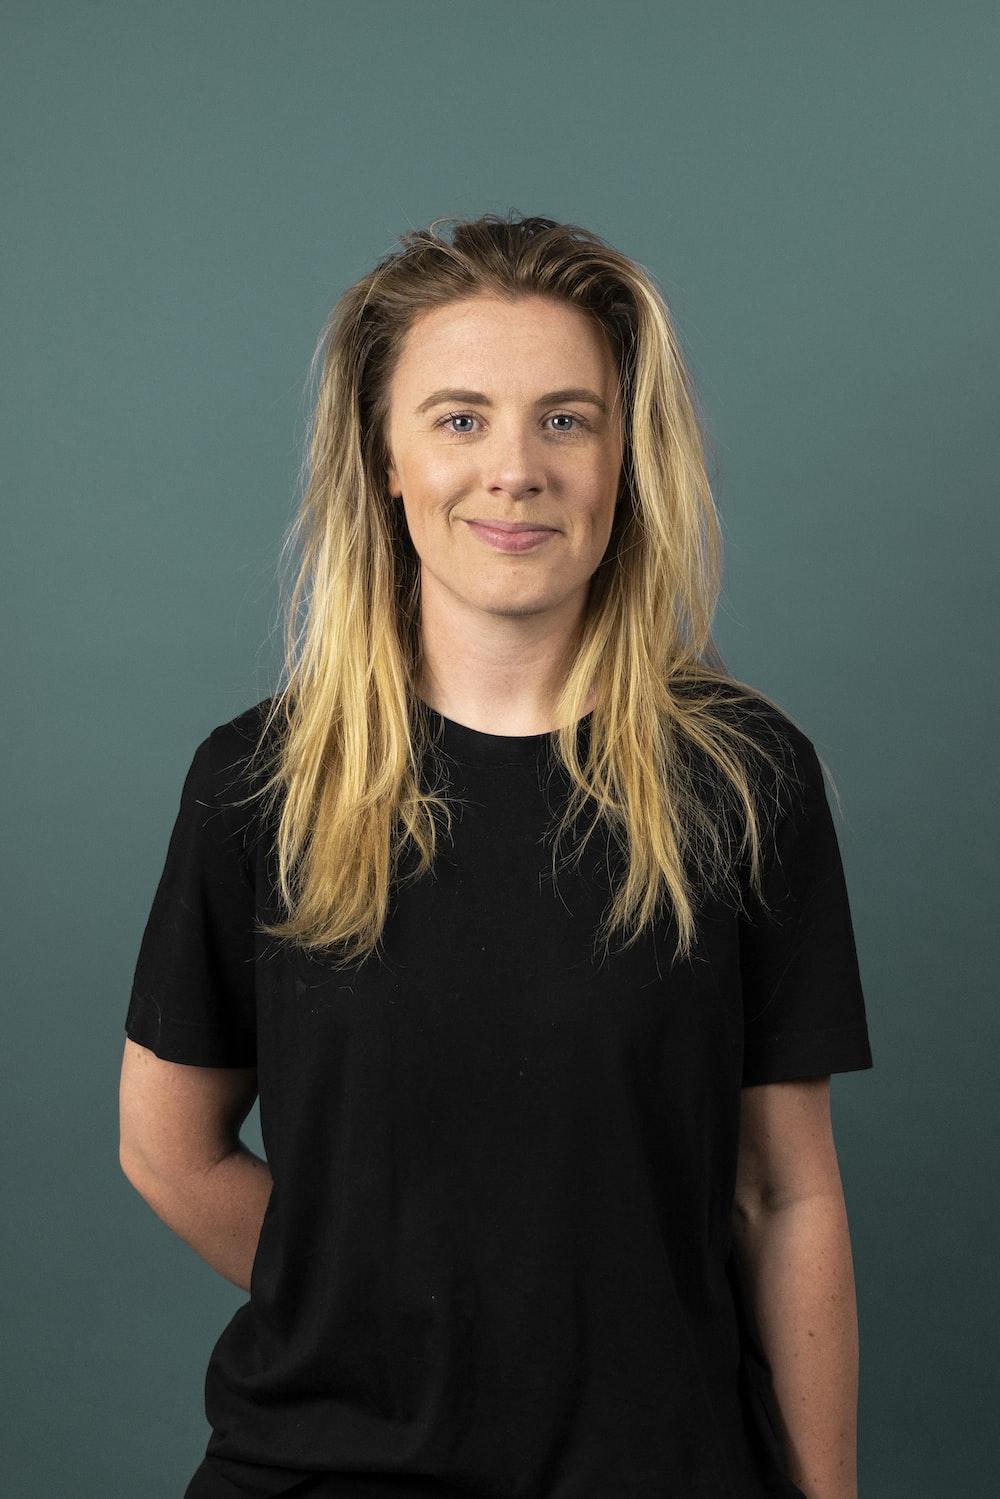 woman in black v neck t-shirt